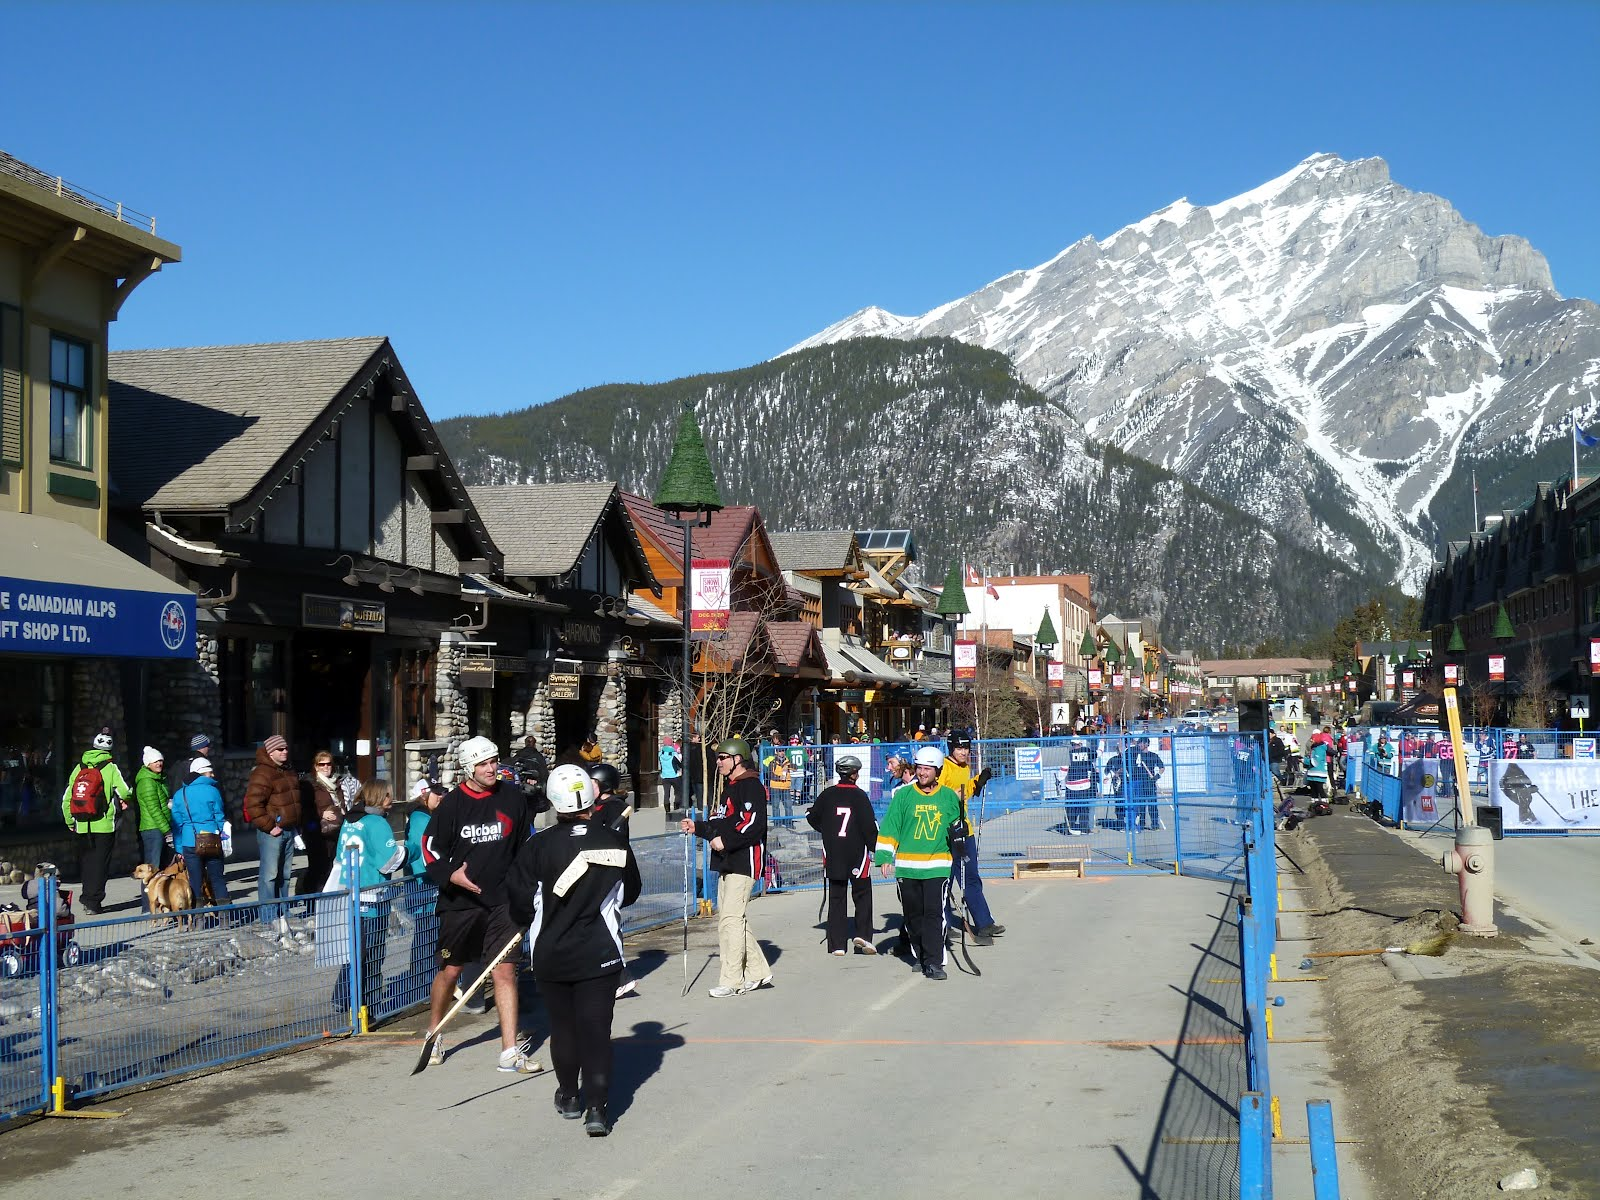 Labels: Banff Lake Louise Tourism Bureau